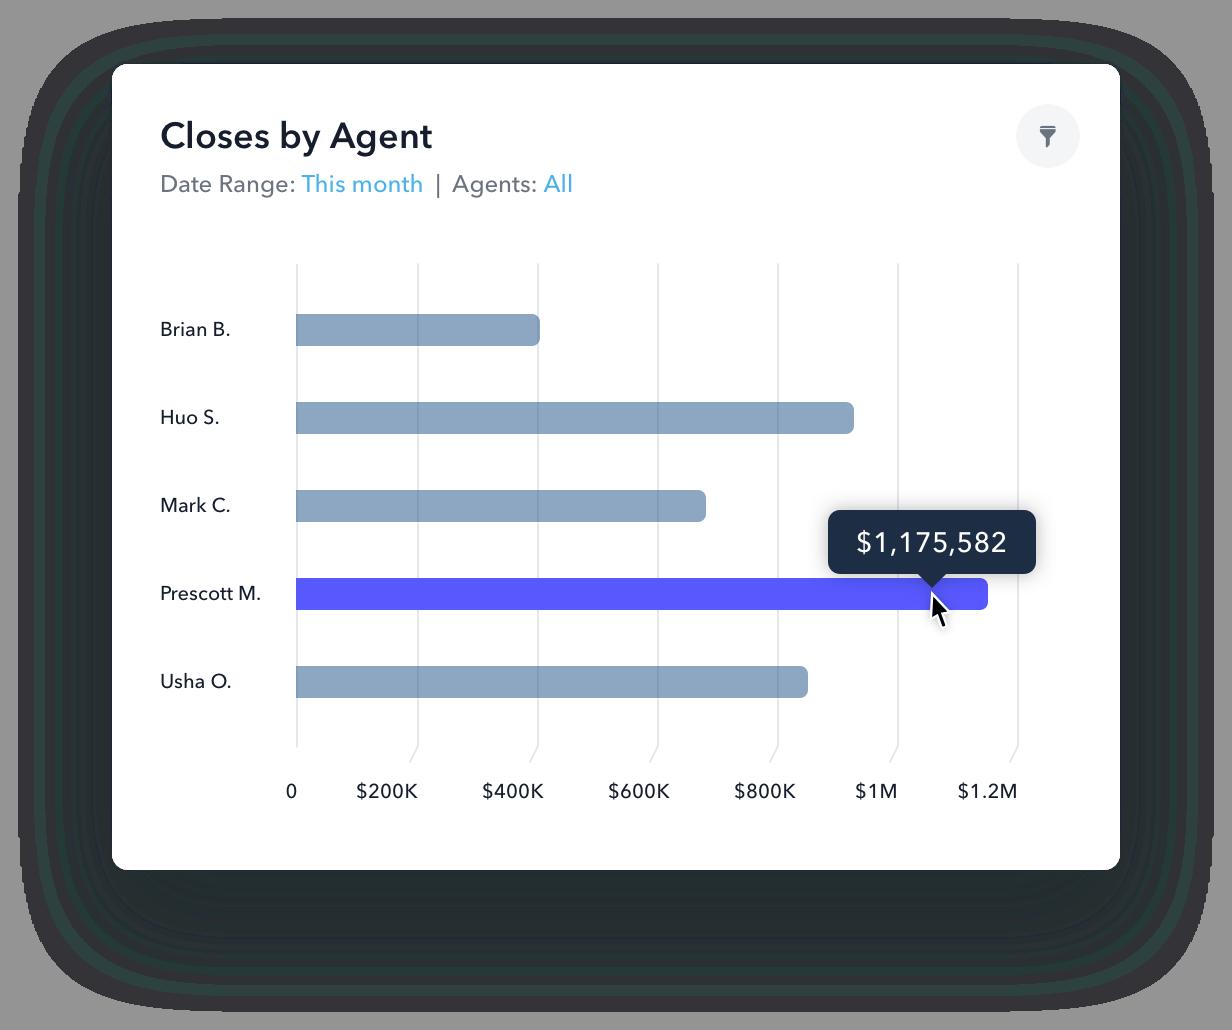 agent volume production report